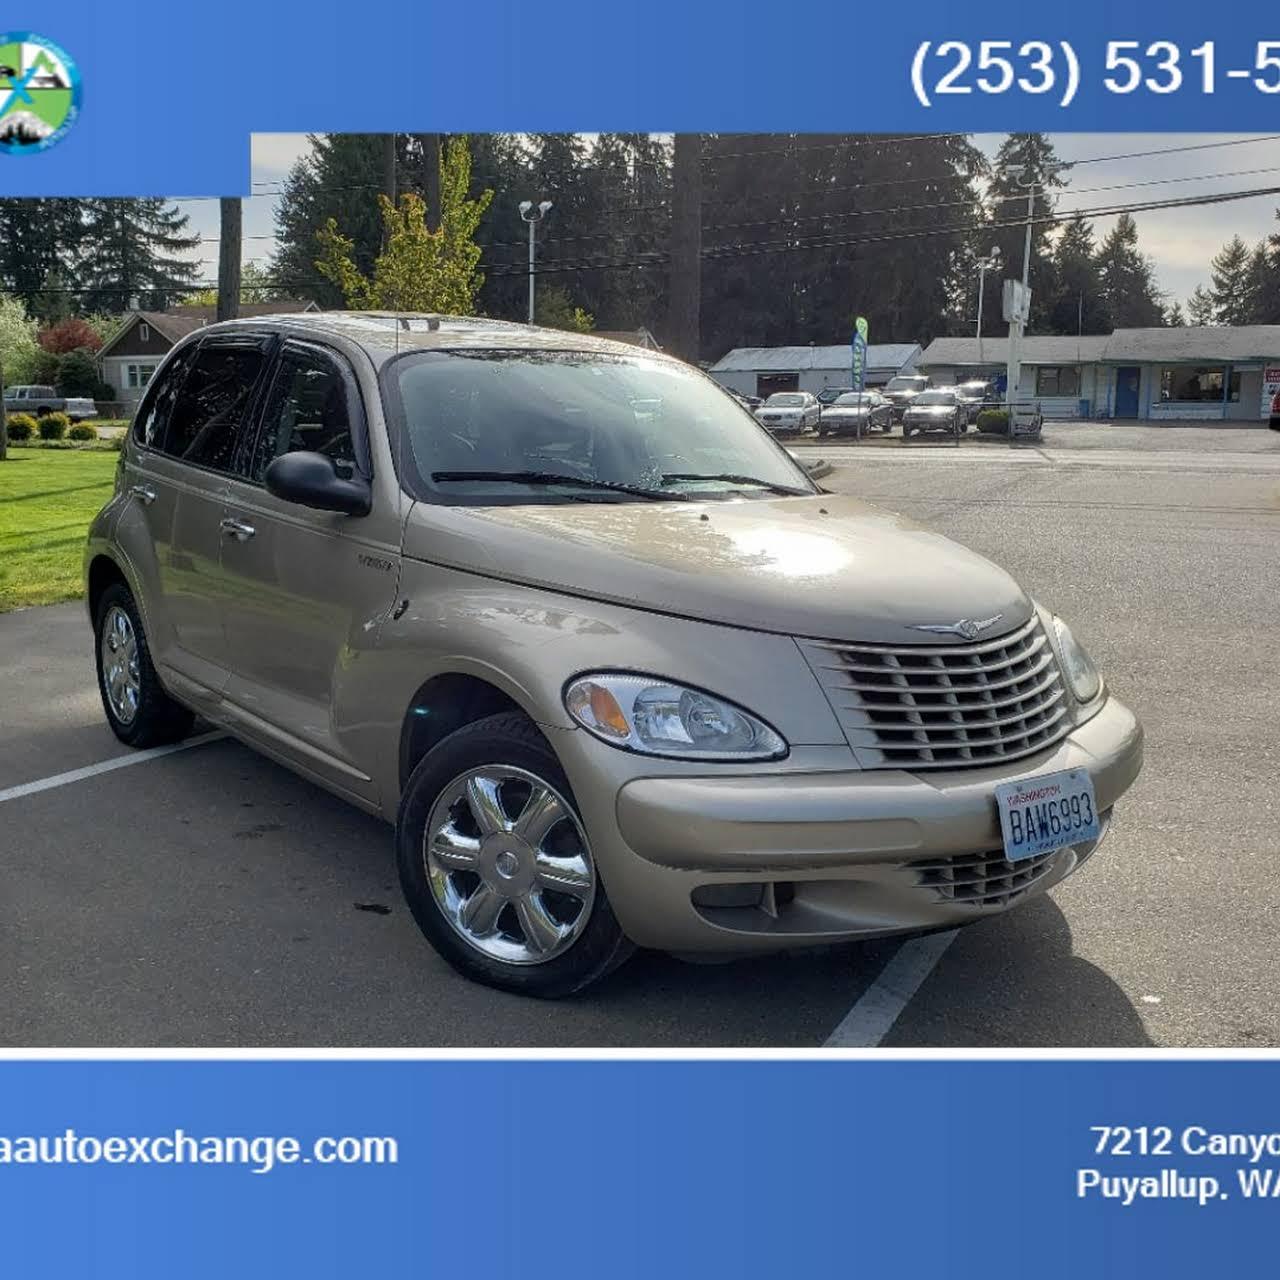 tacoma auto exchange used car dealer in tacoma puyallup tacoma auto exchange business site